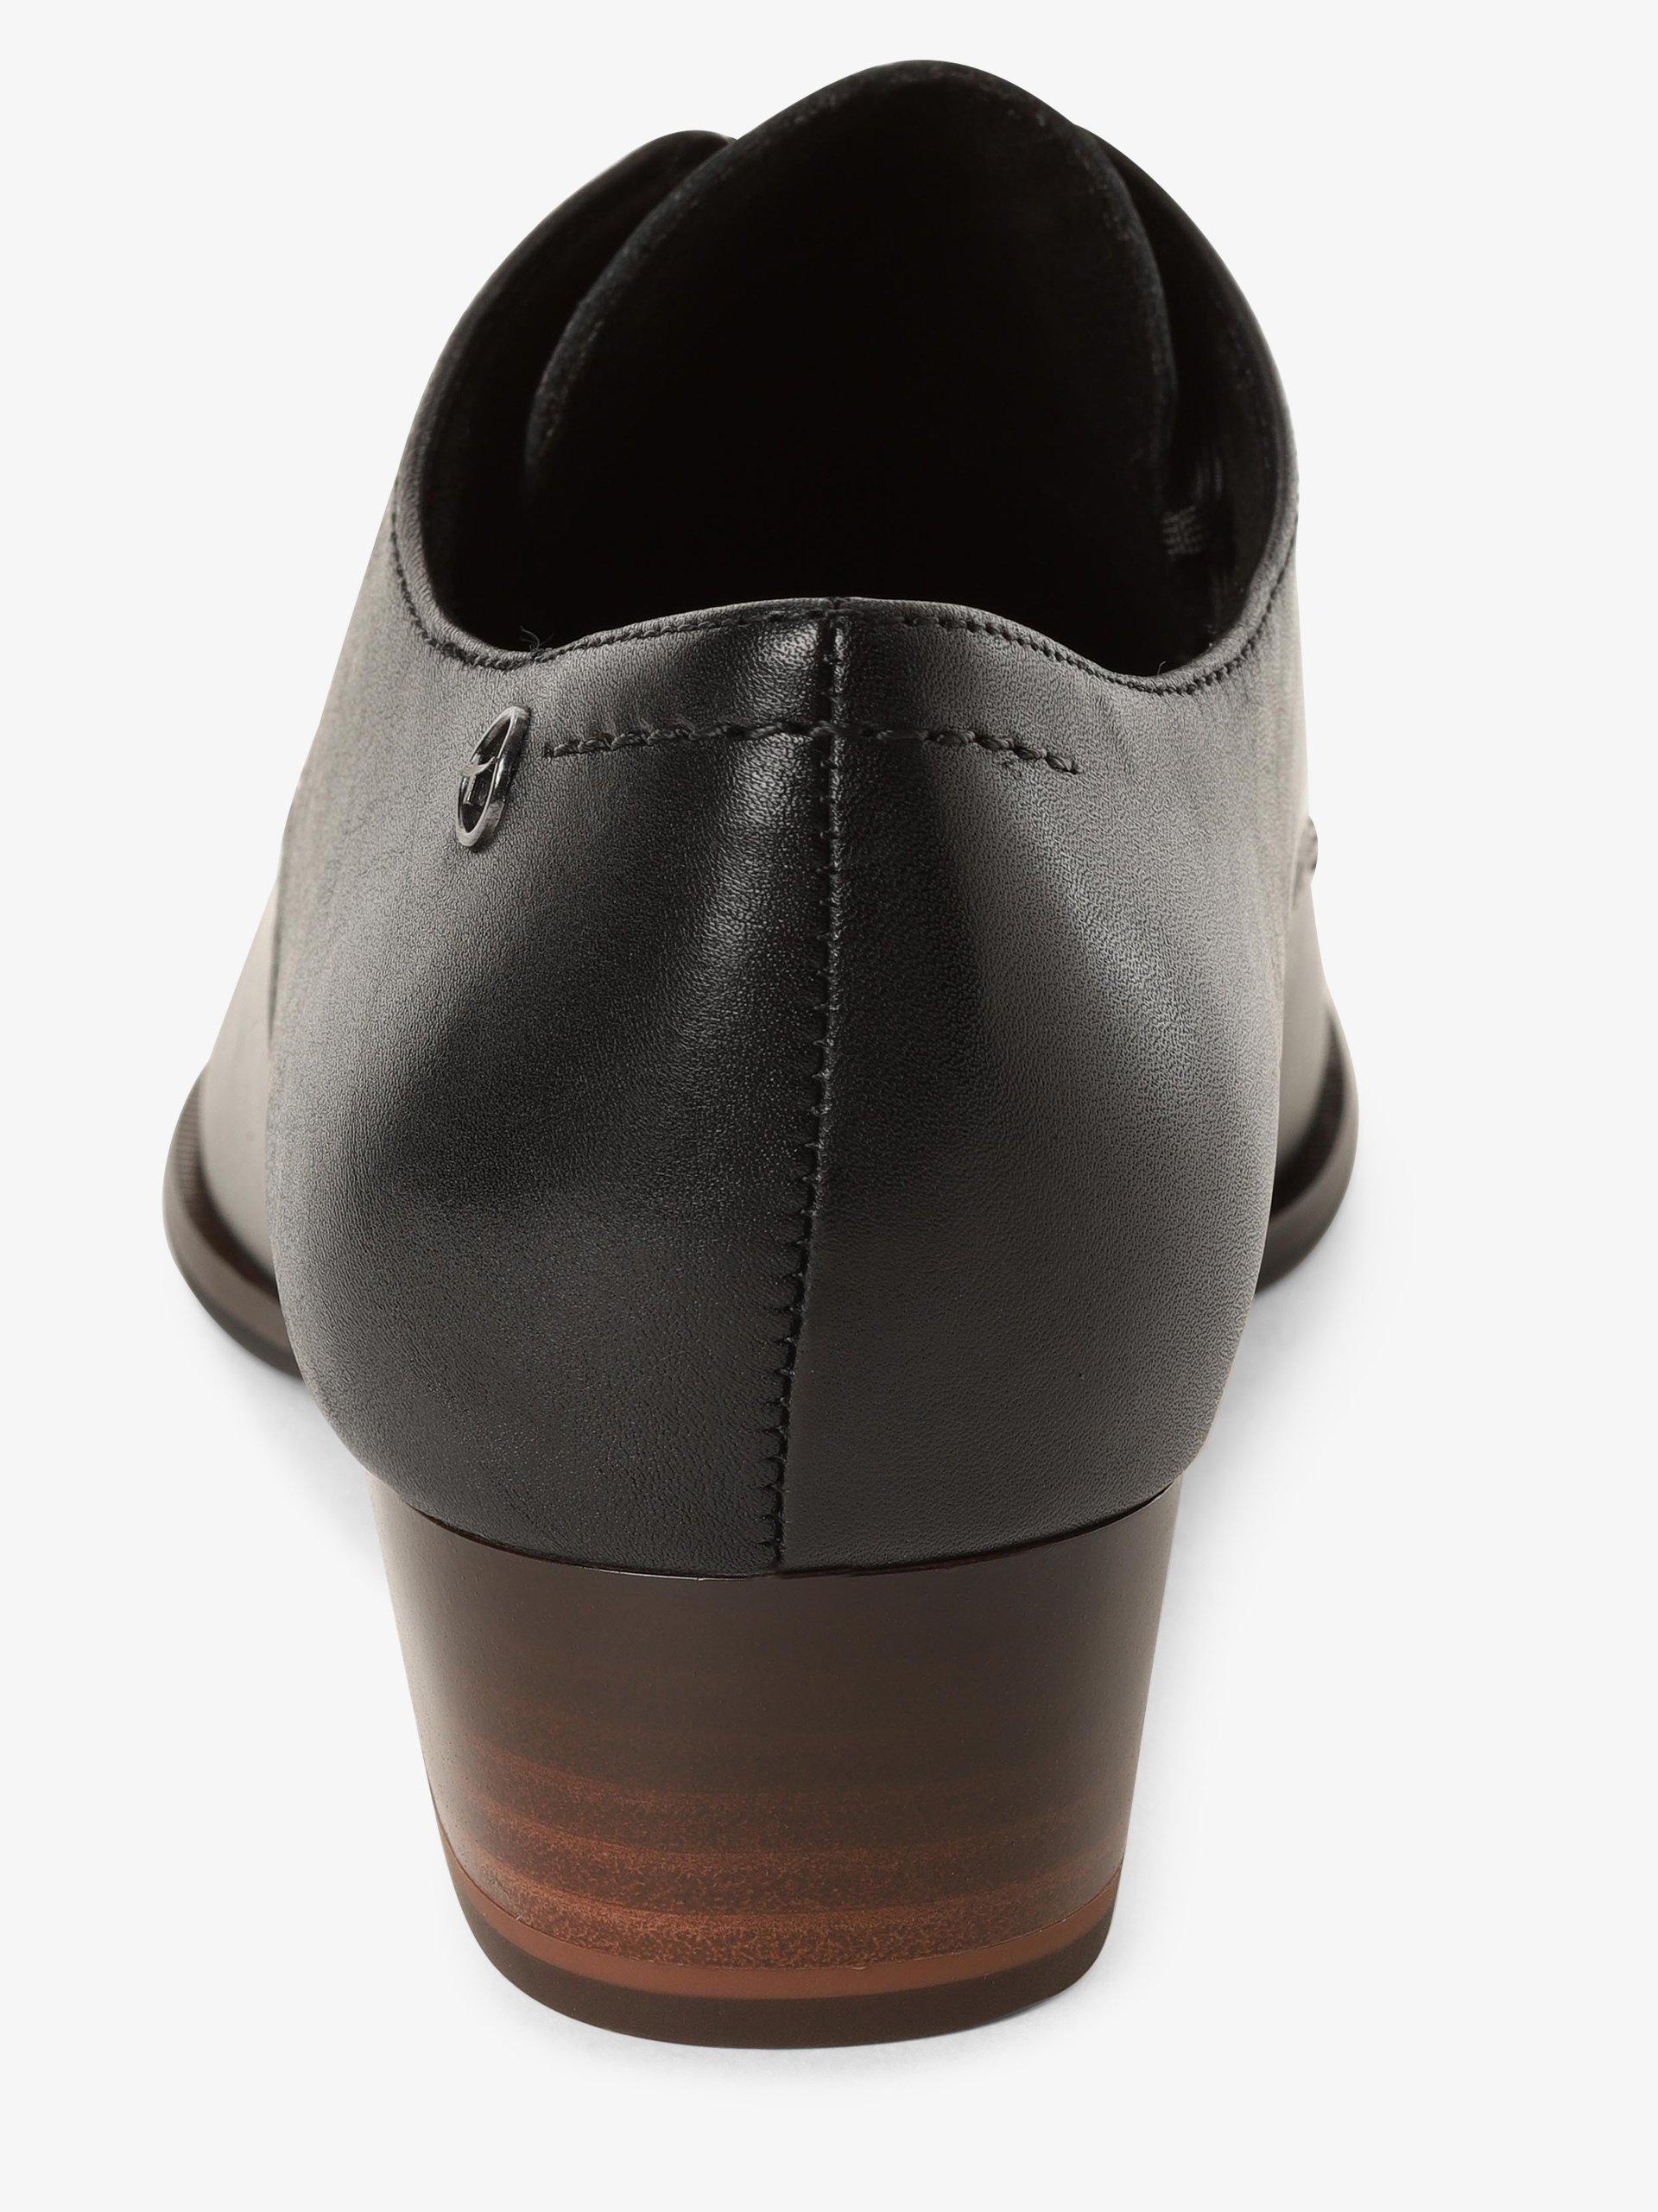 Tamaris Damen Schnürschuhe